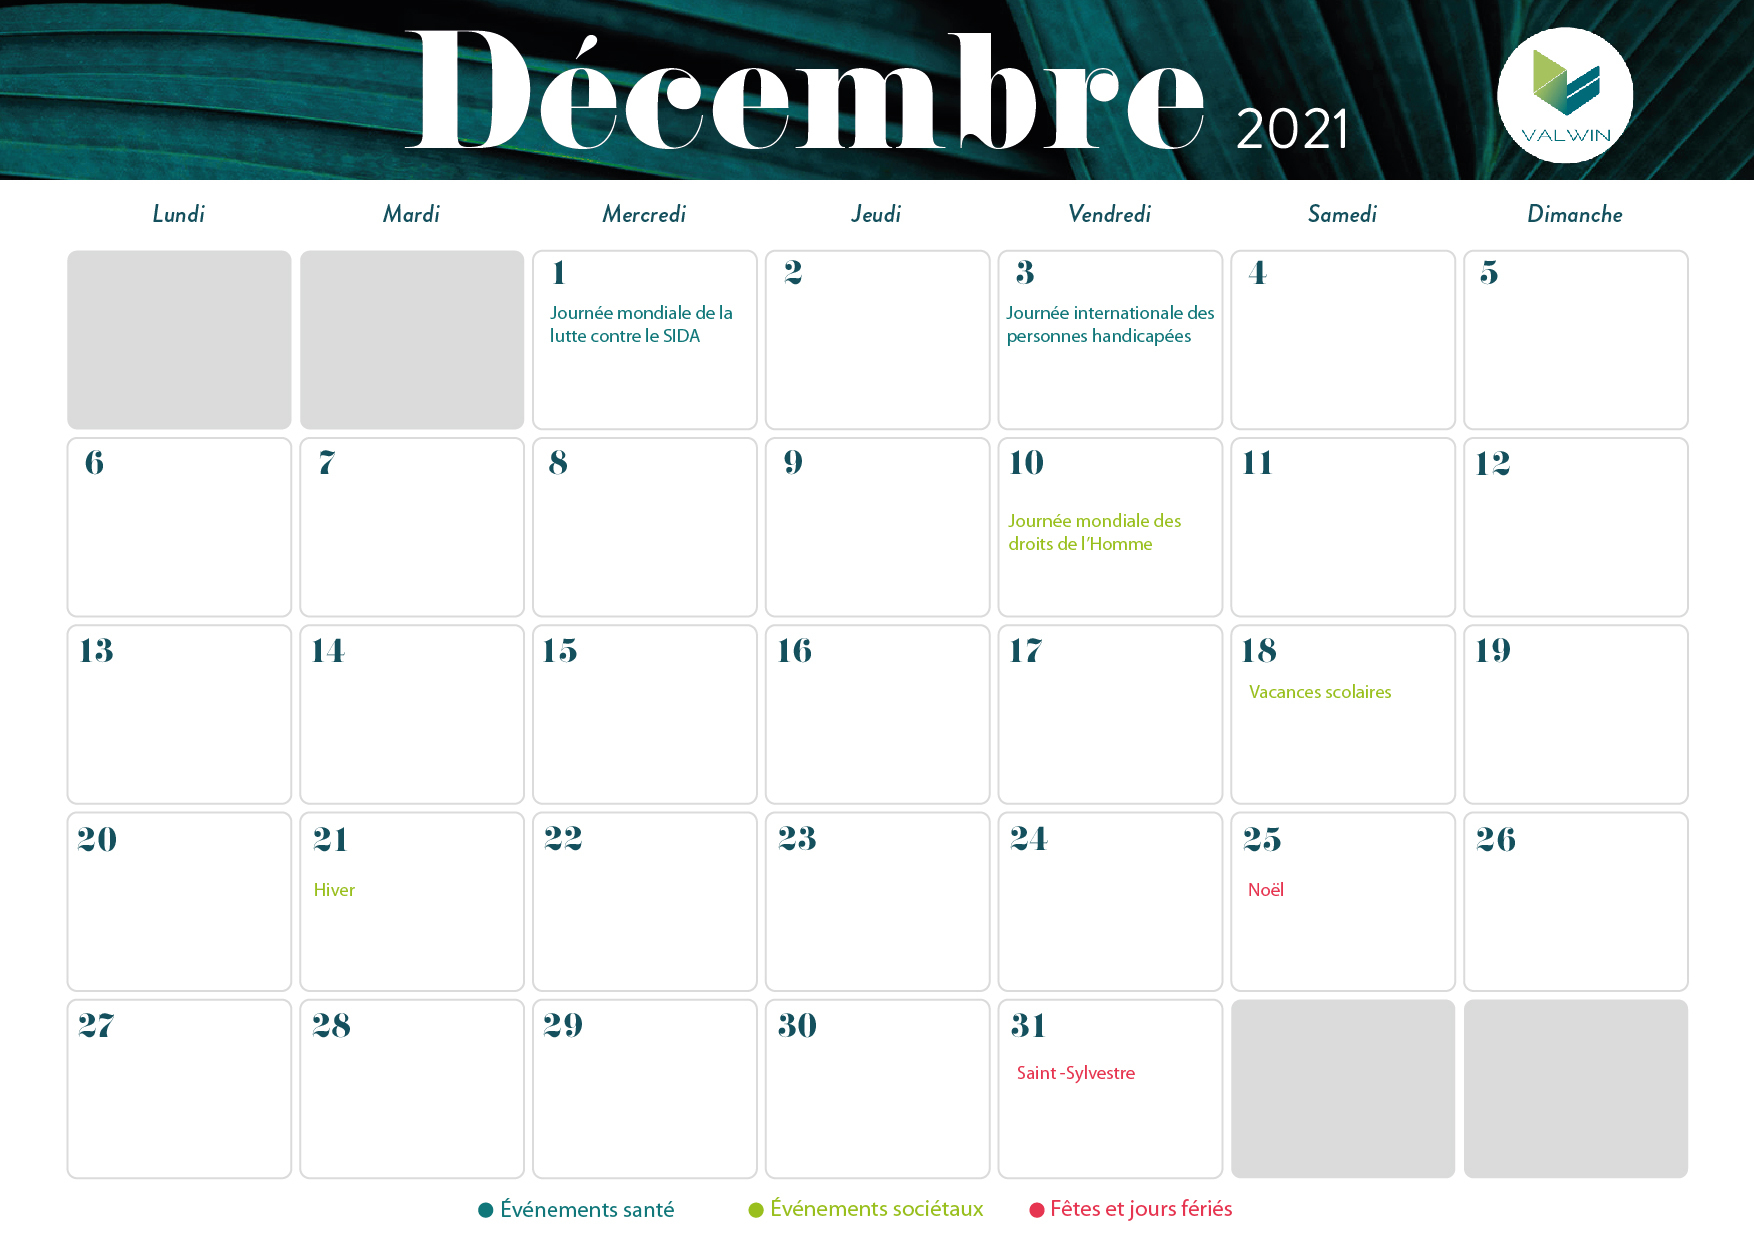 Decembre-calendrier-journee-mondiale-sante-2021.jpg